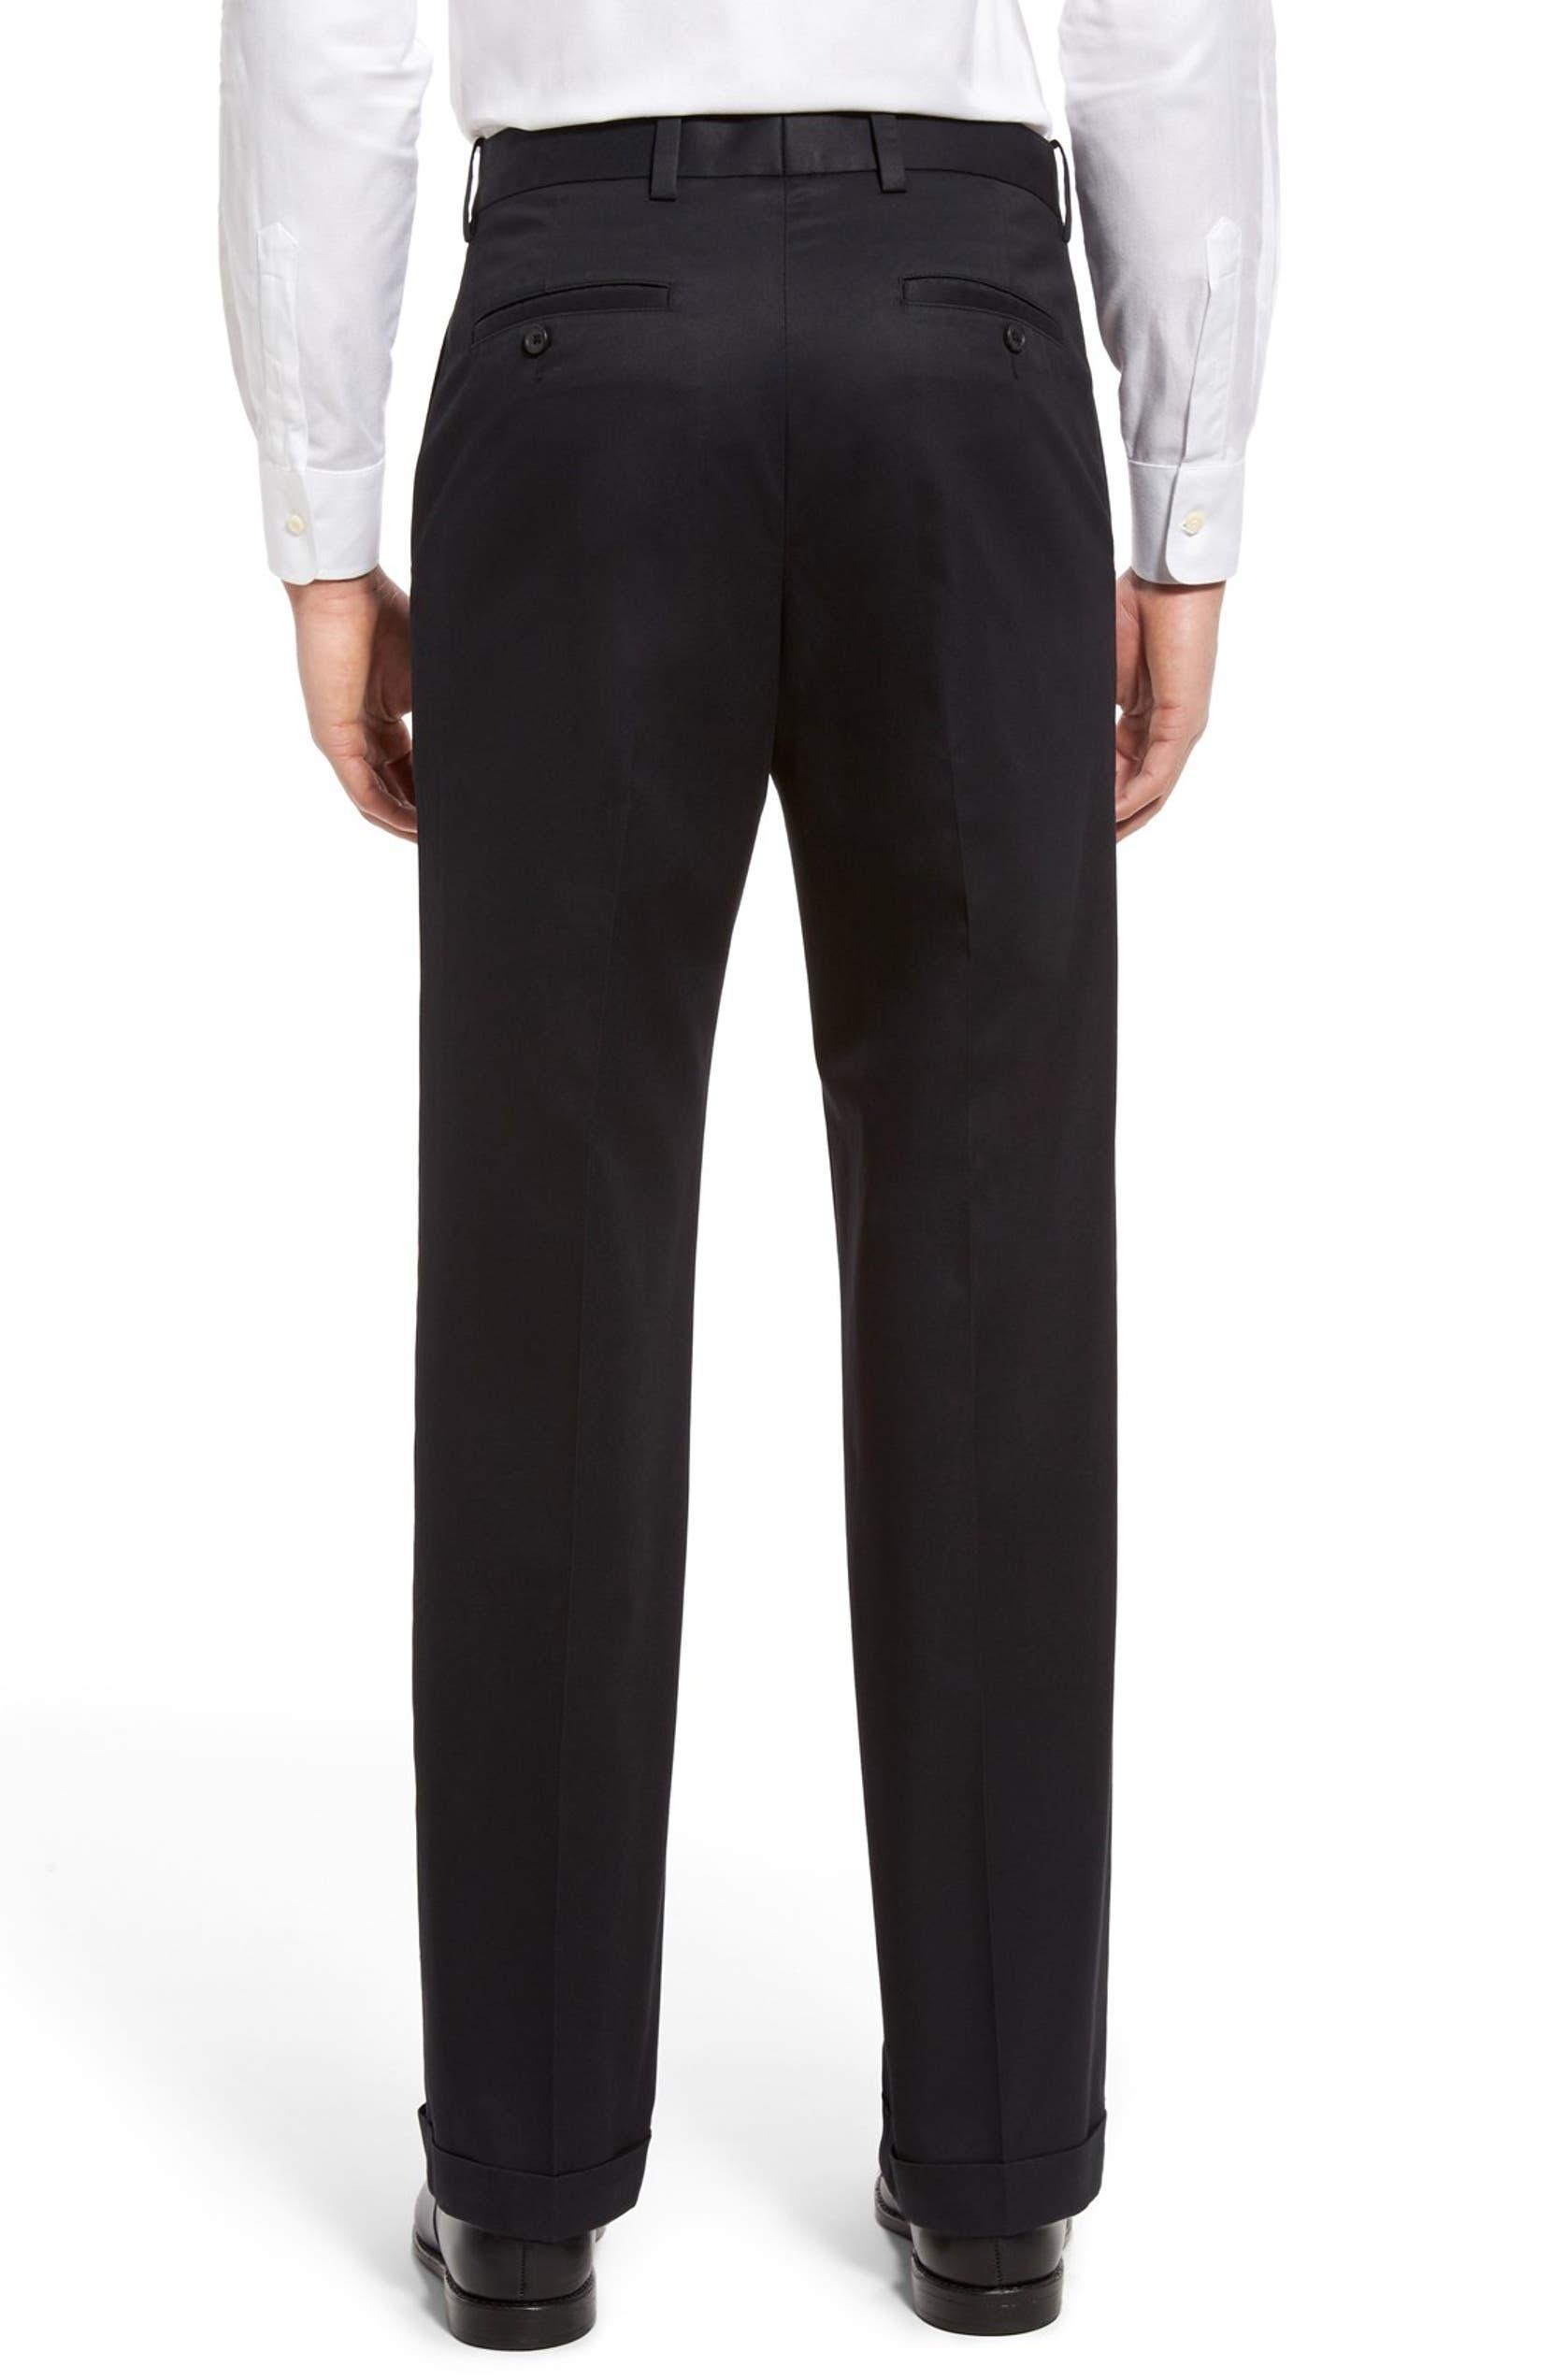 5f11ca5536 Nordstrom Men s Shop Classic Smartcare™ Supima® Cotton Pleated Trousers